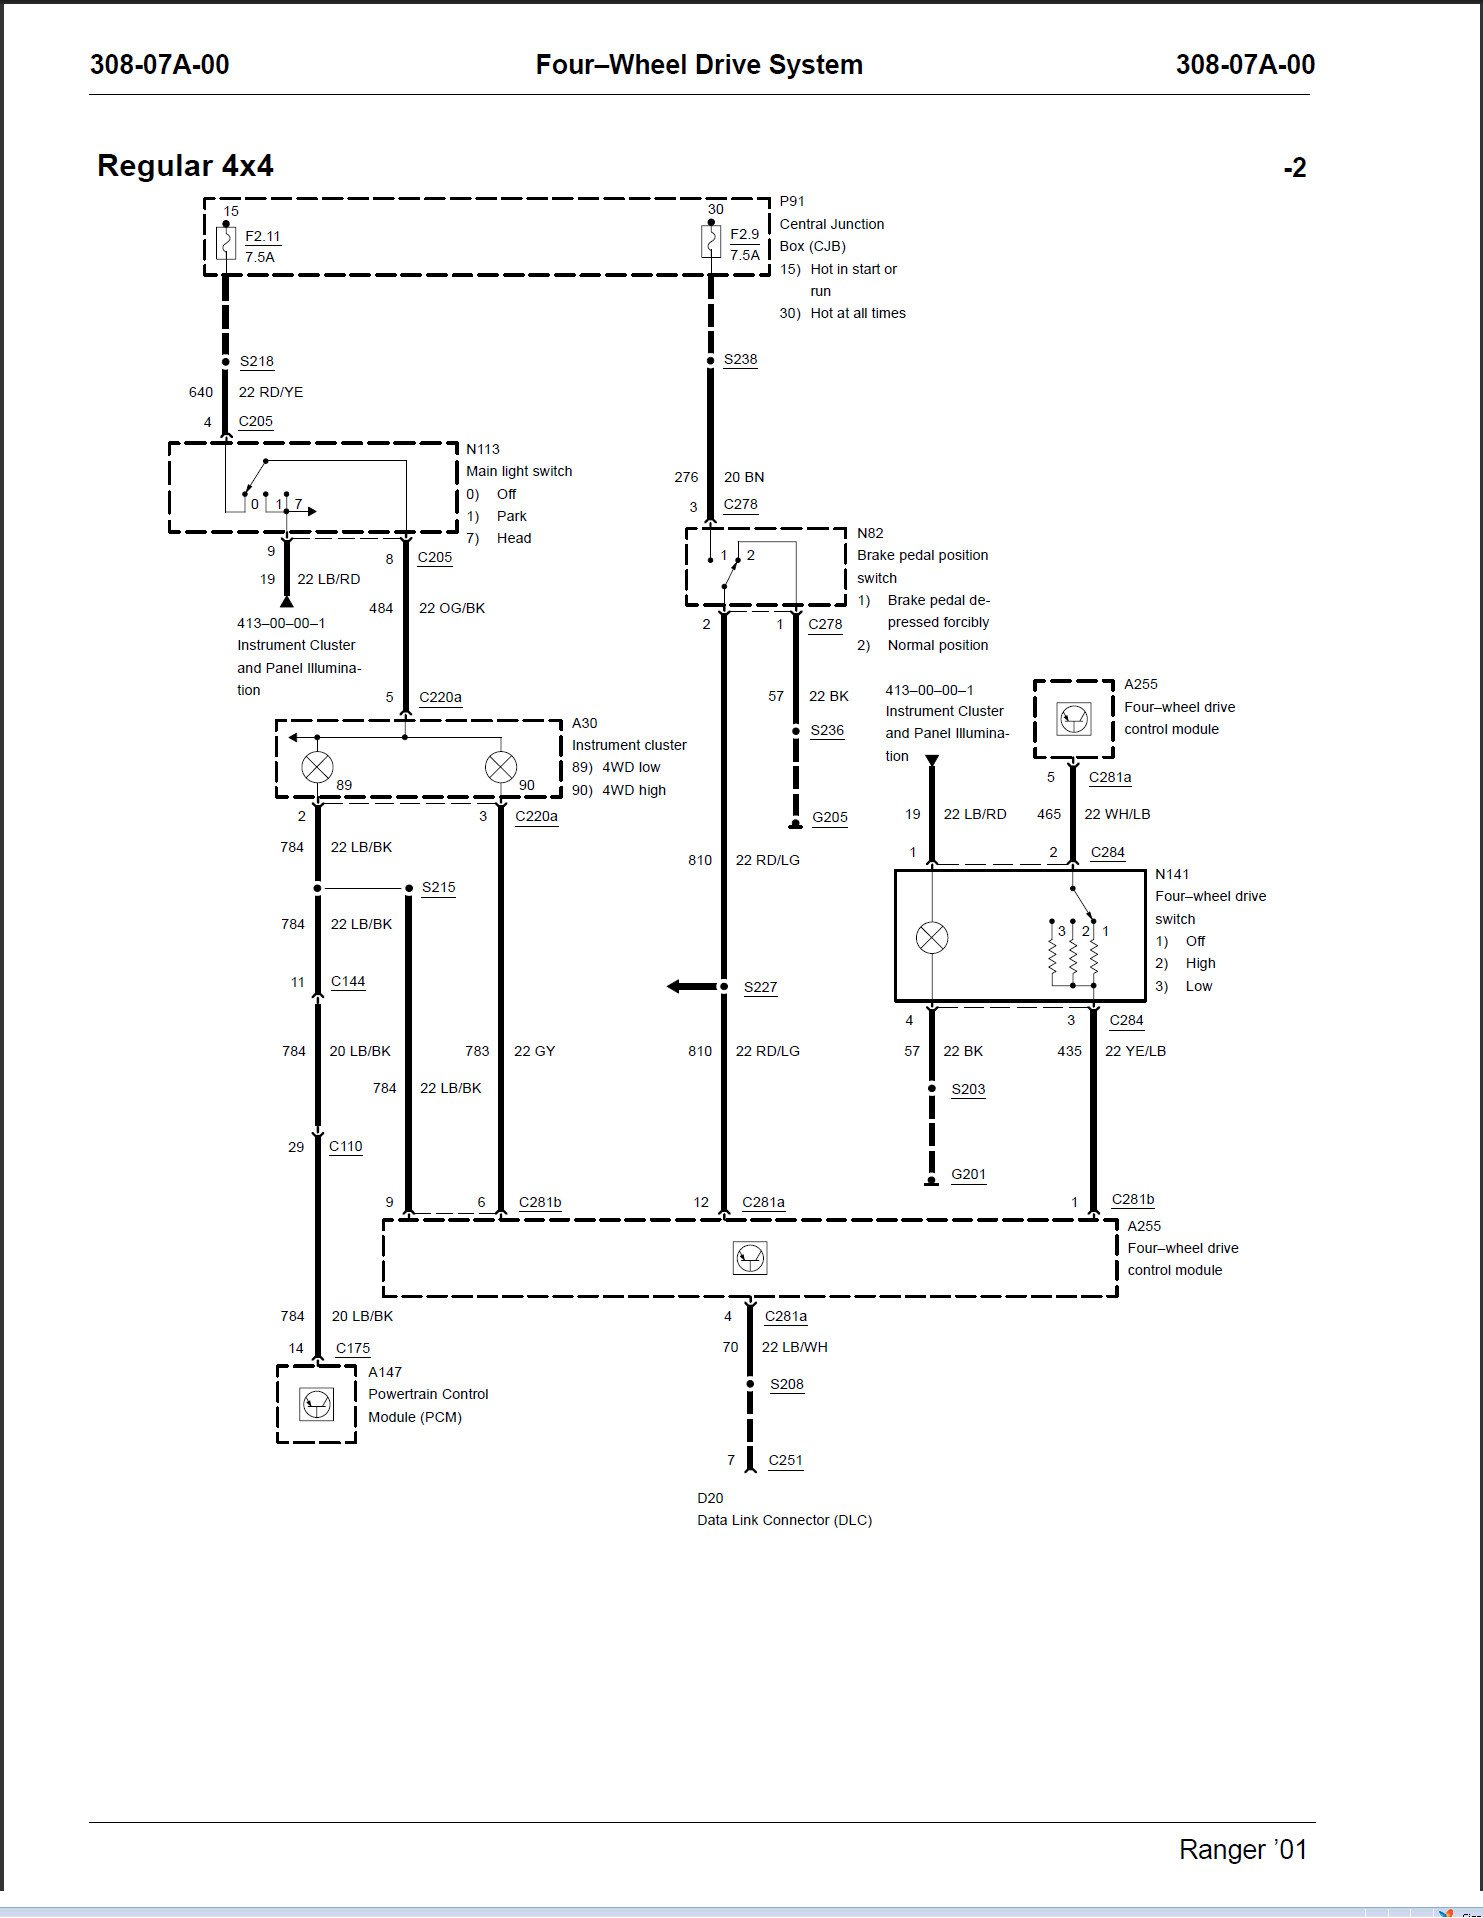 DIAGRAM] 94 Ford Ranger 4x4 Wiring Diagram FULL Version HD Quality Wiring  Diagram - ITDIAGRAM.HELENE-COIFFURE-ROUEN.FR Diagram Database